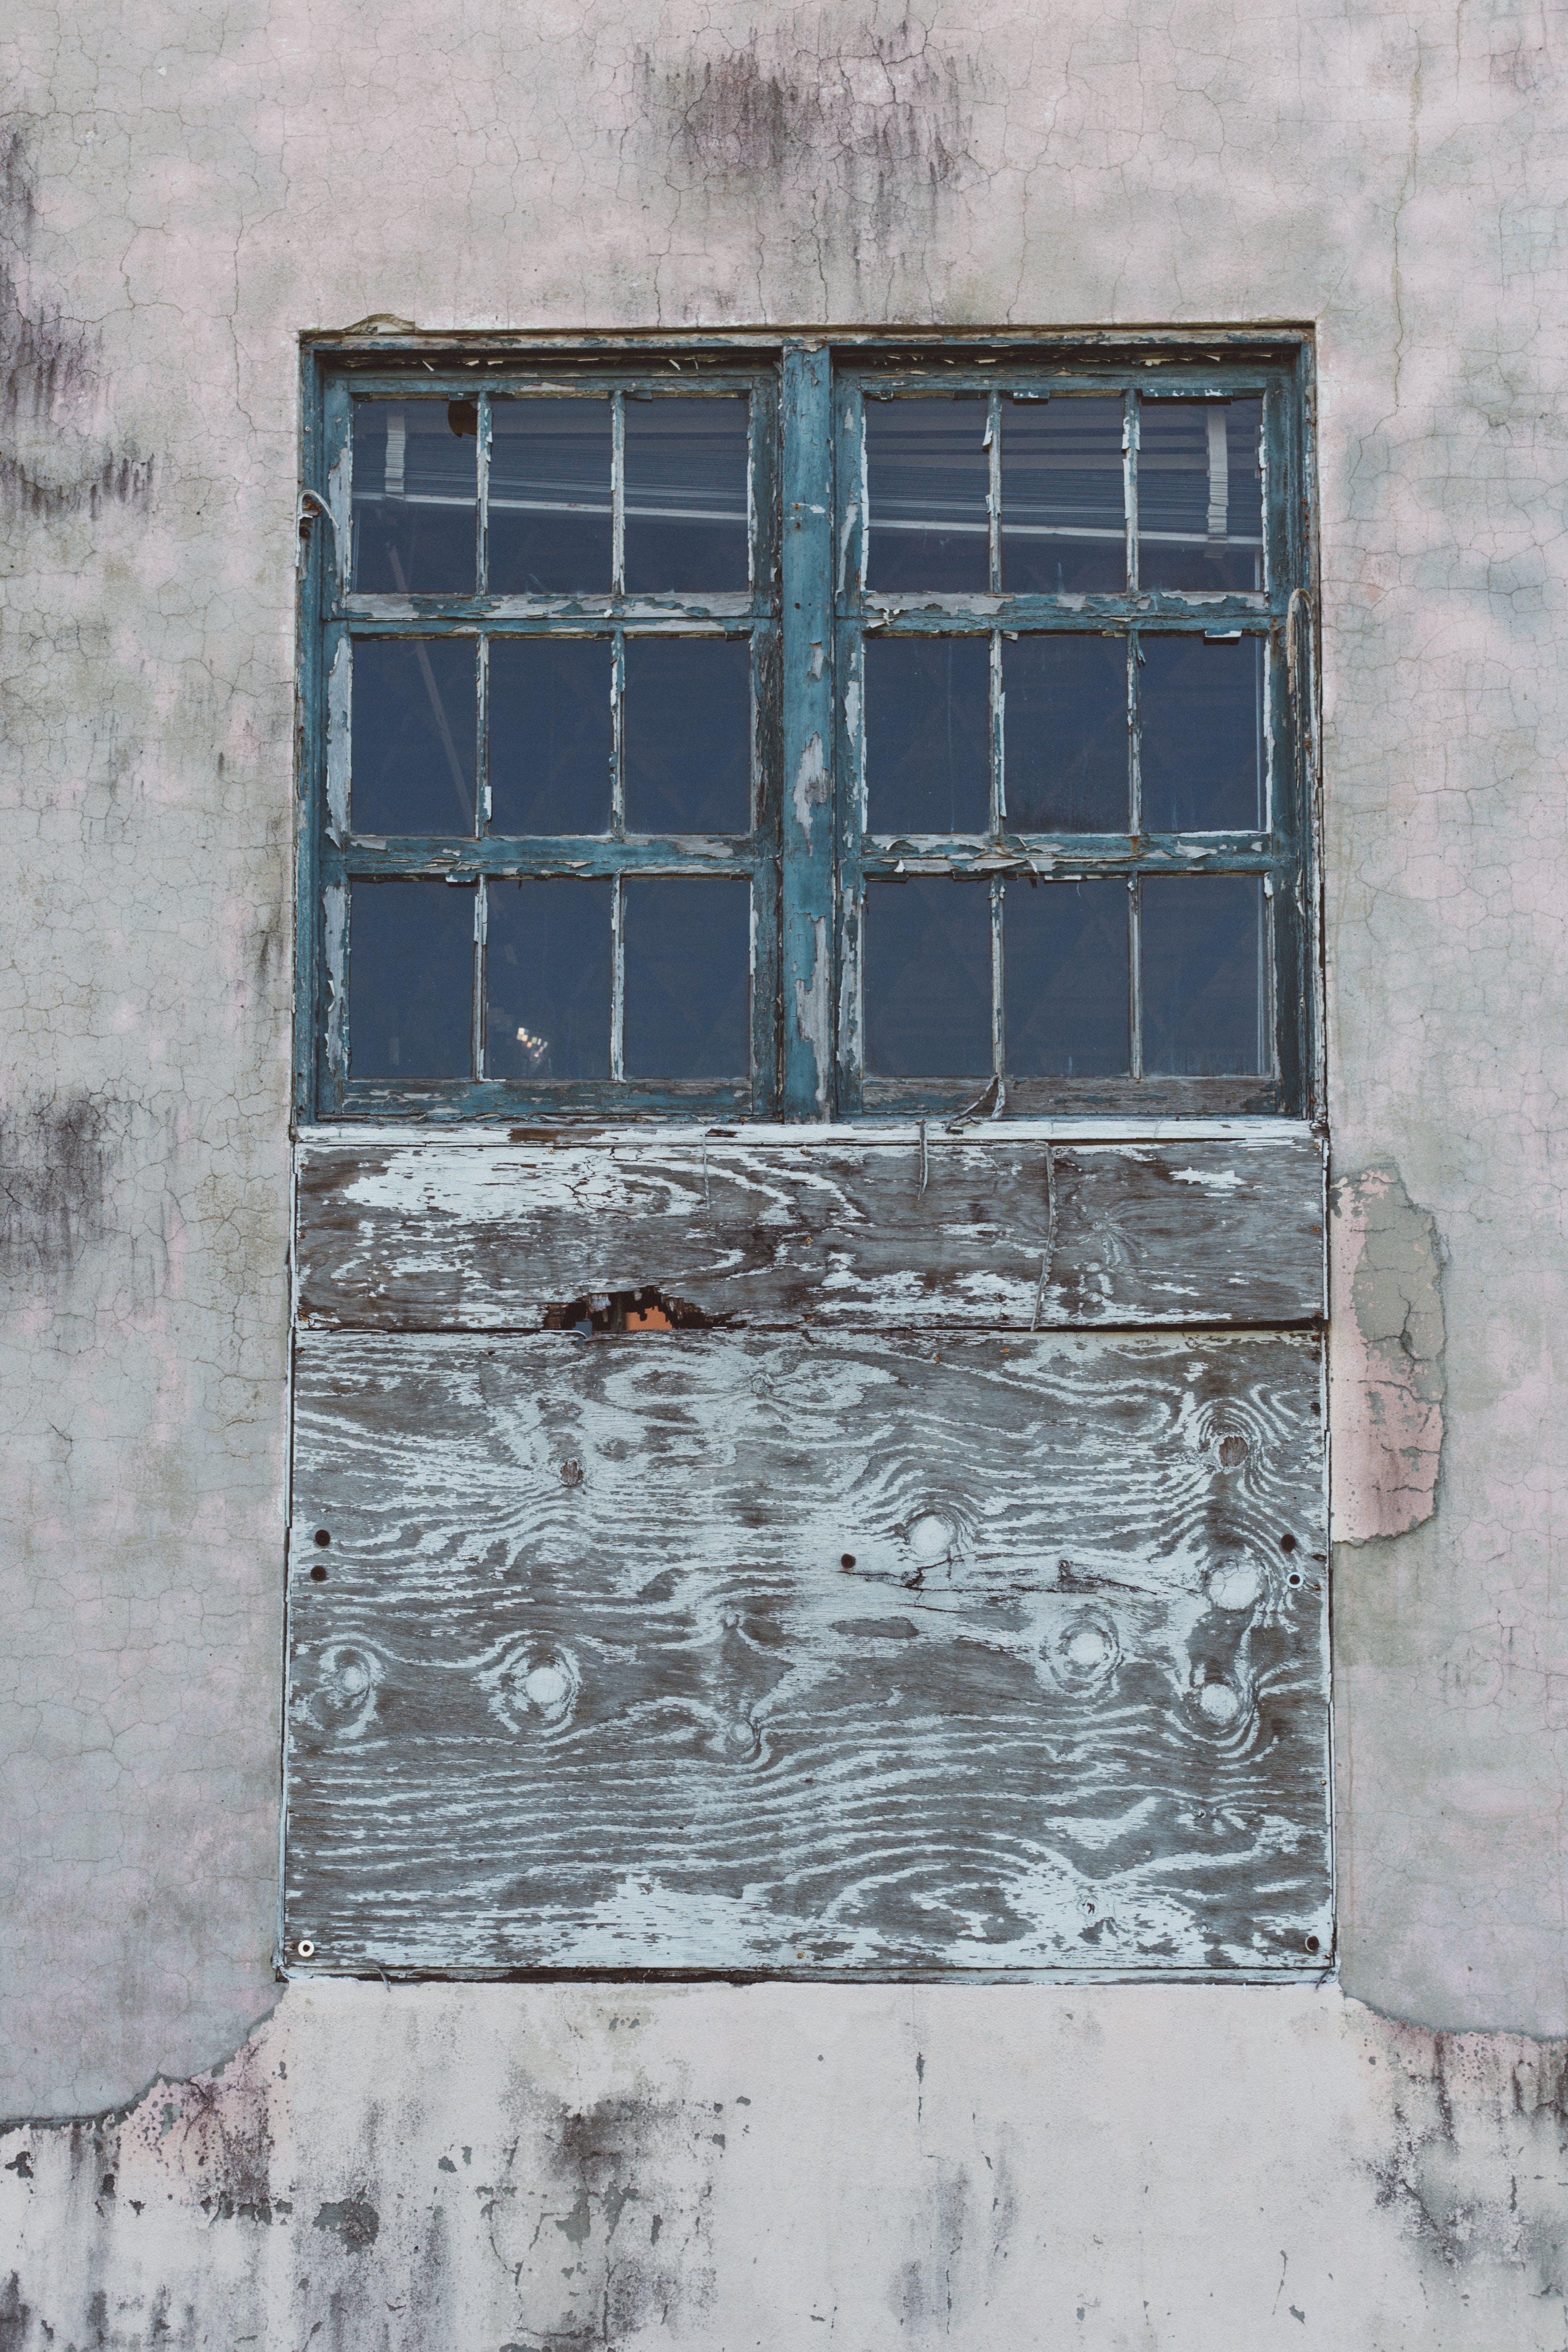 Blue Wooden Window Frame